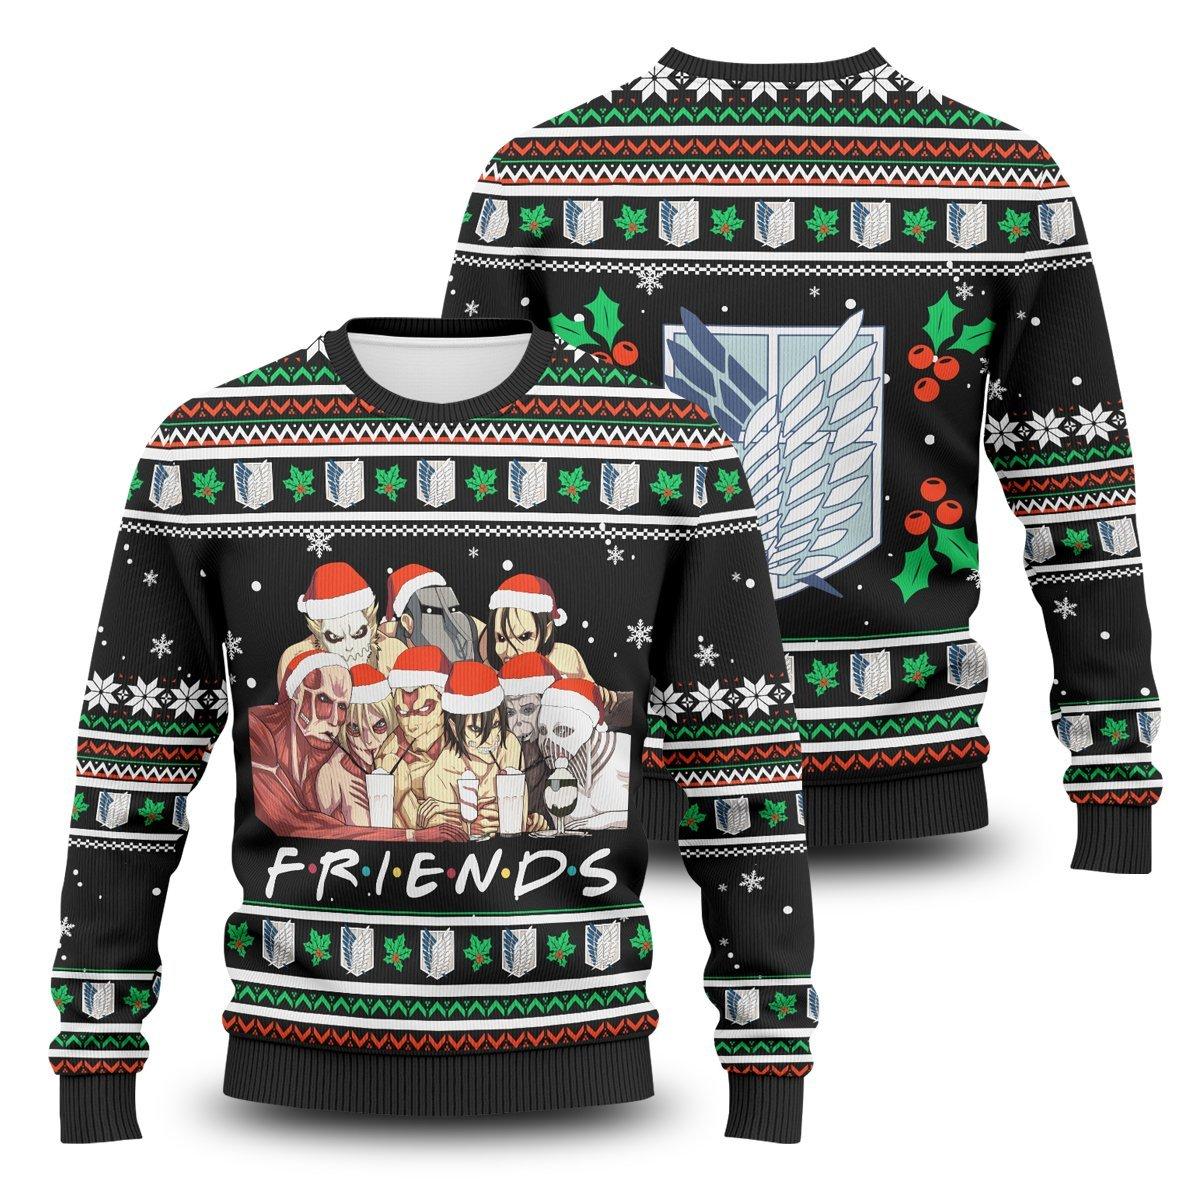 Nine Titans Friends Unisex Wool Sweater FDM0310 S Official Otaku Treat Merch